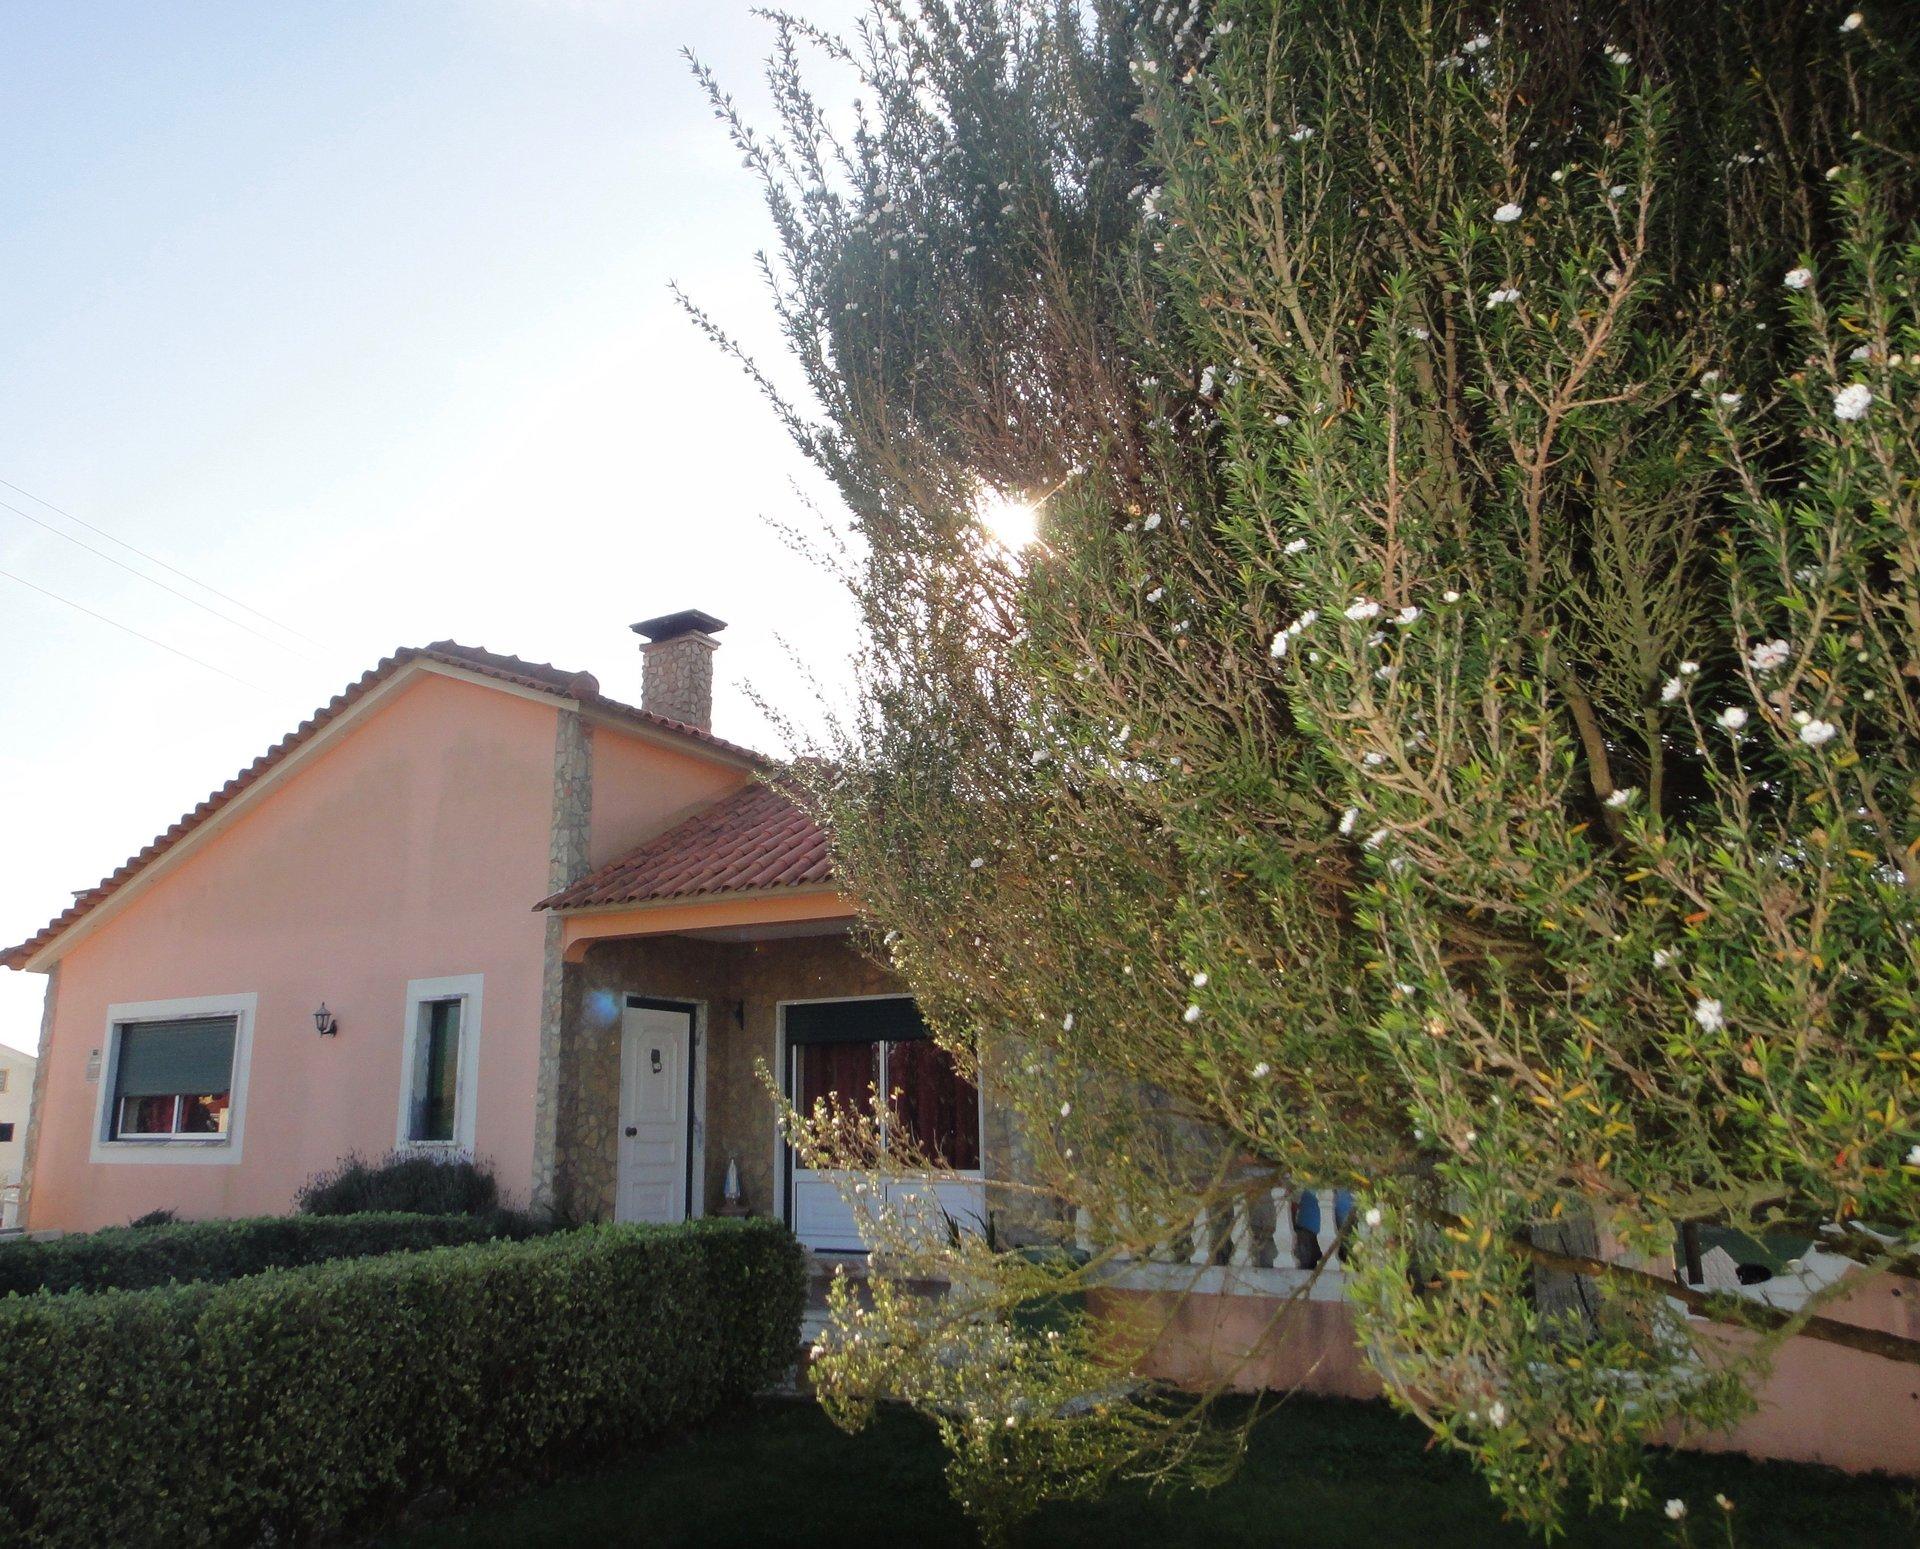 3 Bedroom Villa Reguengo Grande, Silver Coast Ref: AV2052